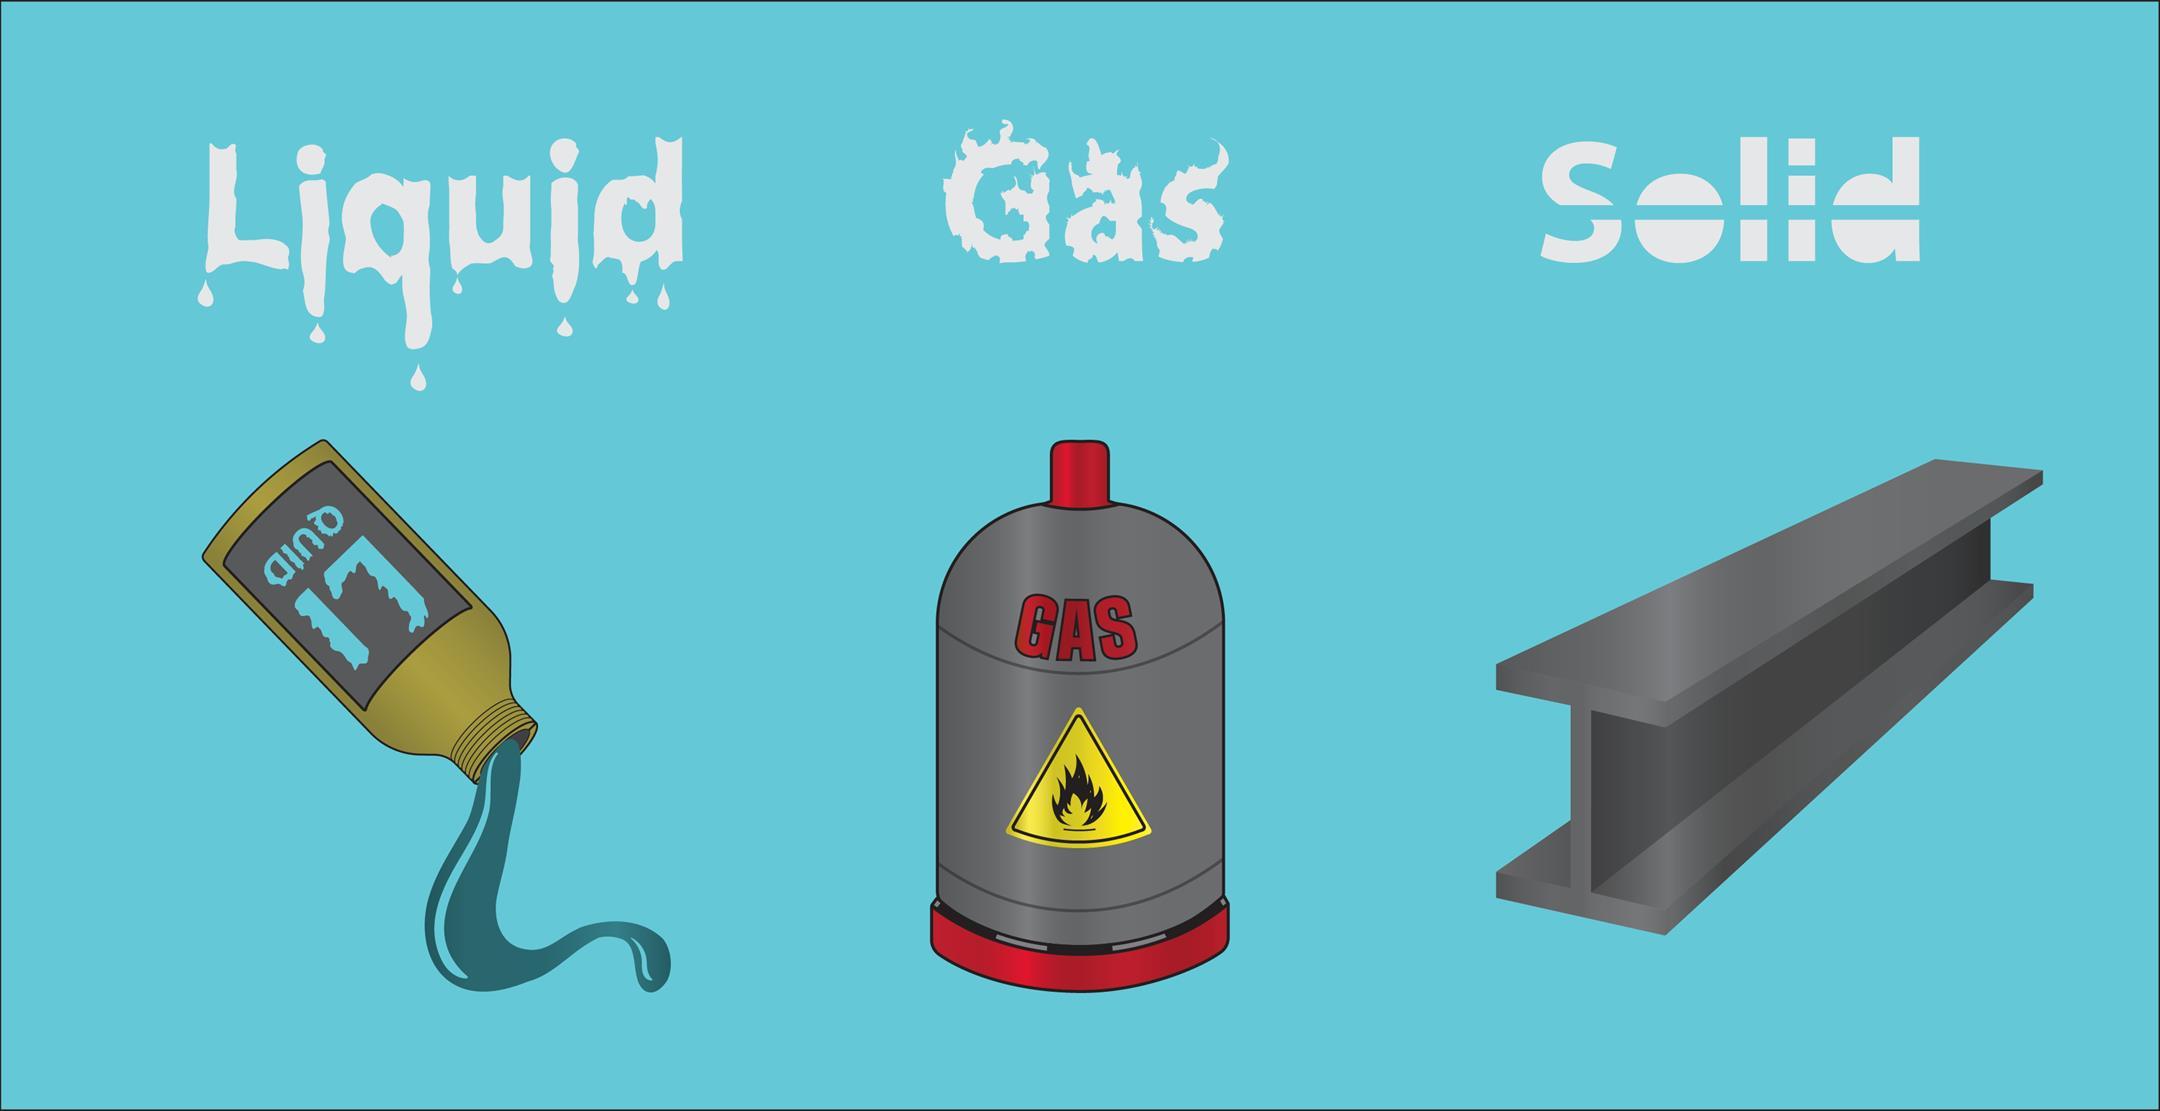 -liquid-gas-solid-illustration-big2160x1111